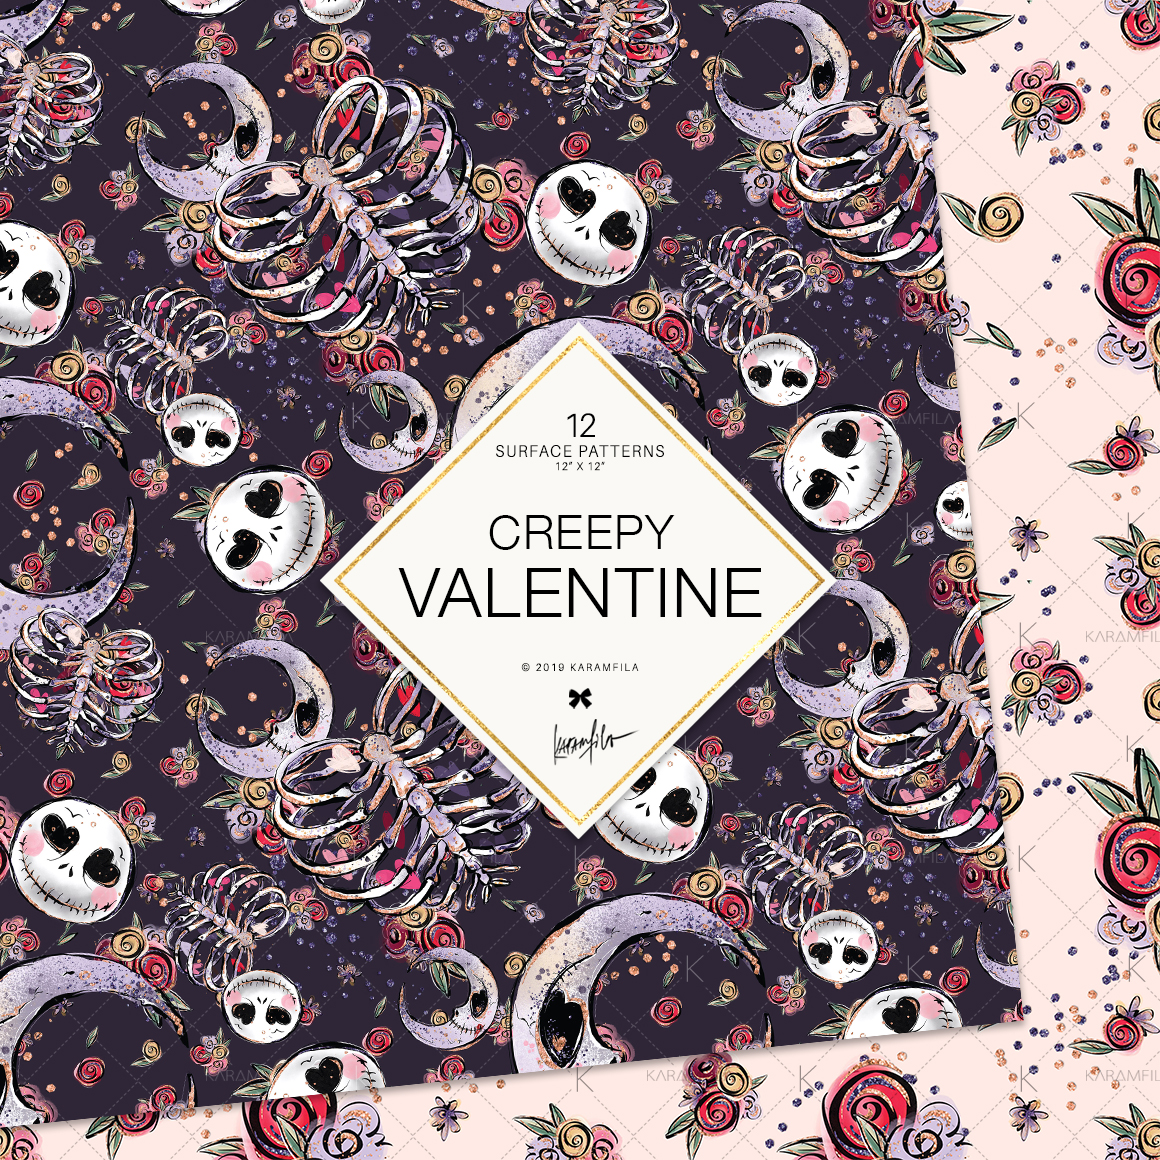 Creepy Valentine's Day Patterns example image 2